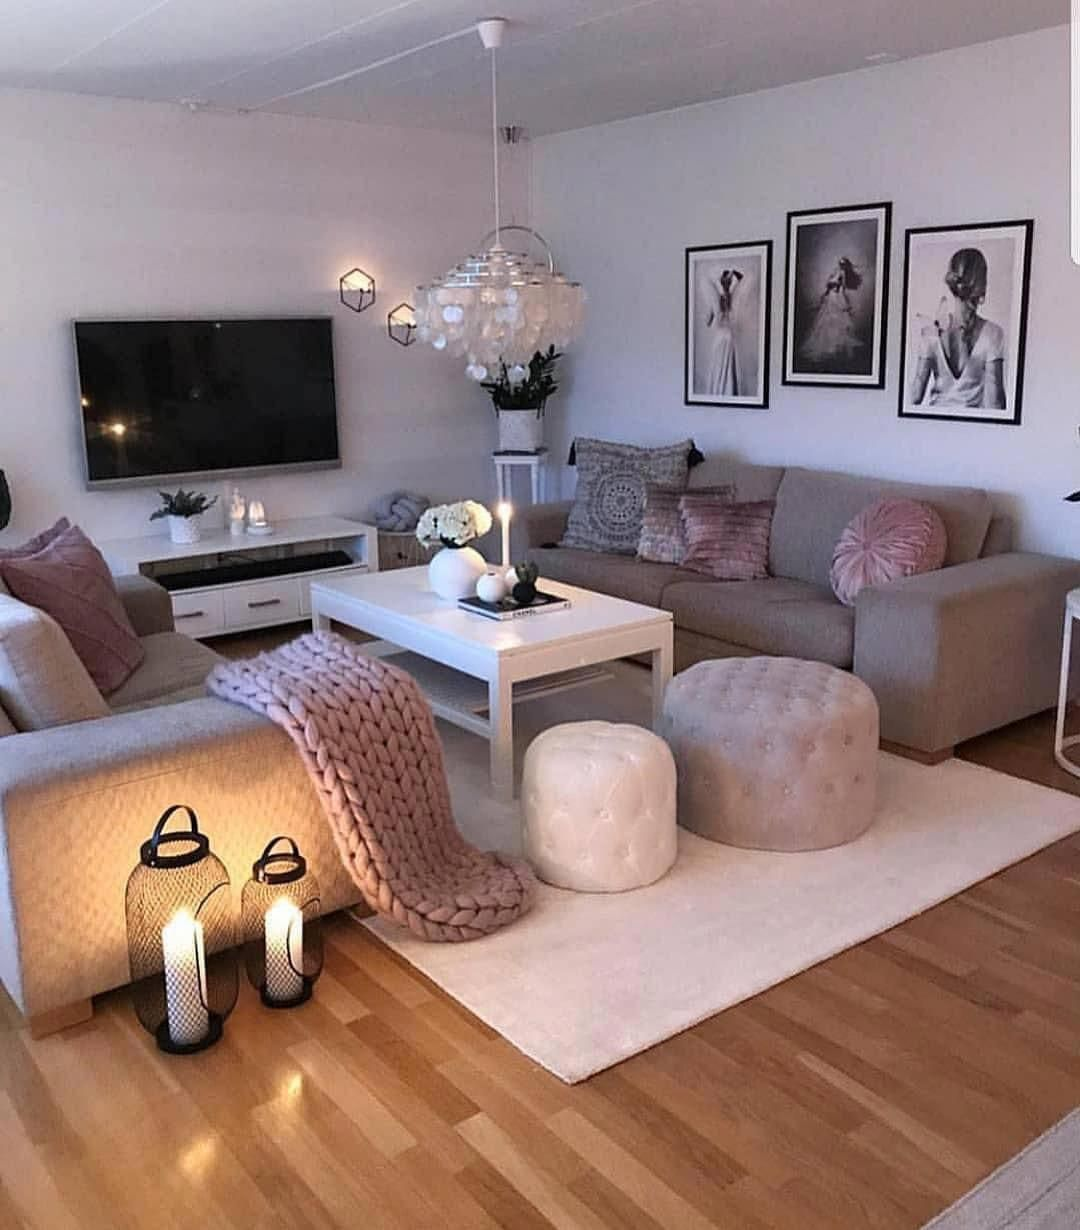 40 Most Beautiful Living Room Ideas 2019 Living Room Ideas 2019